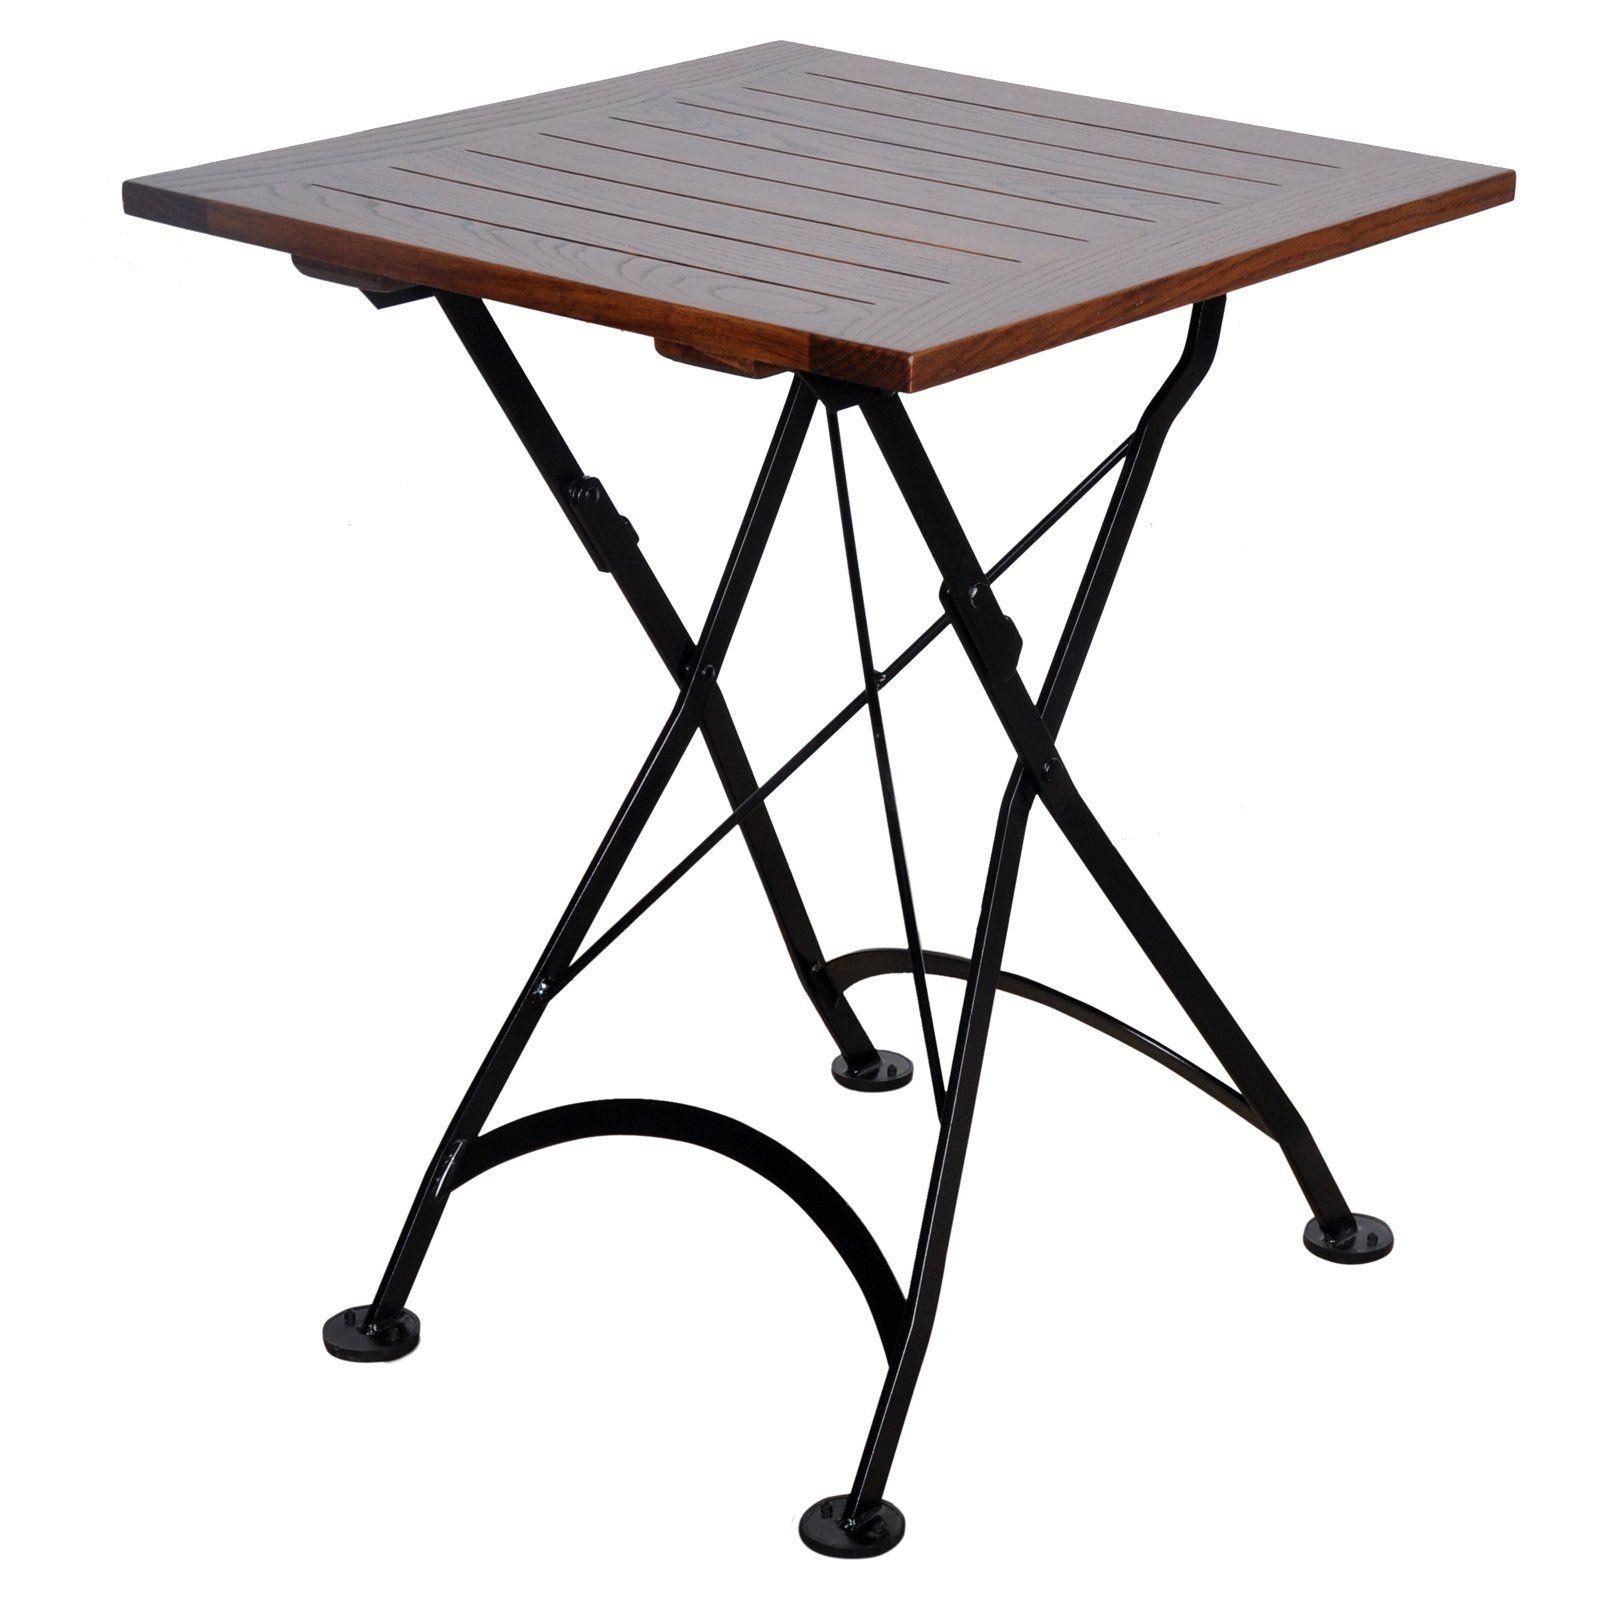 Awe Inspiring Outdoor Furniture Designhouse French Veranda European Cafe Beatyapartments Chair Design Images Beatyapartmentscom